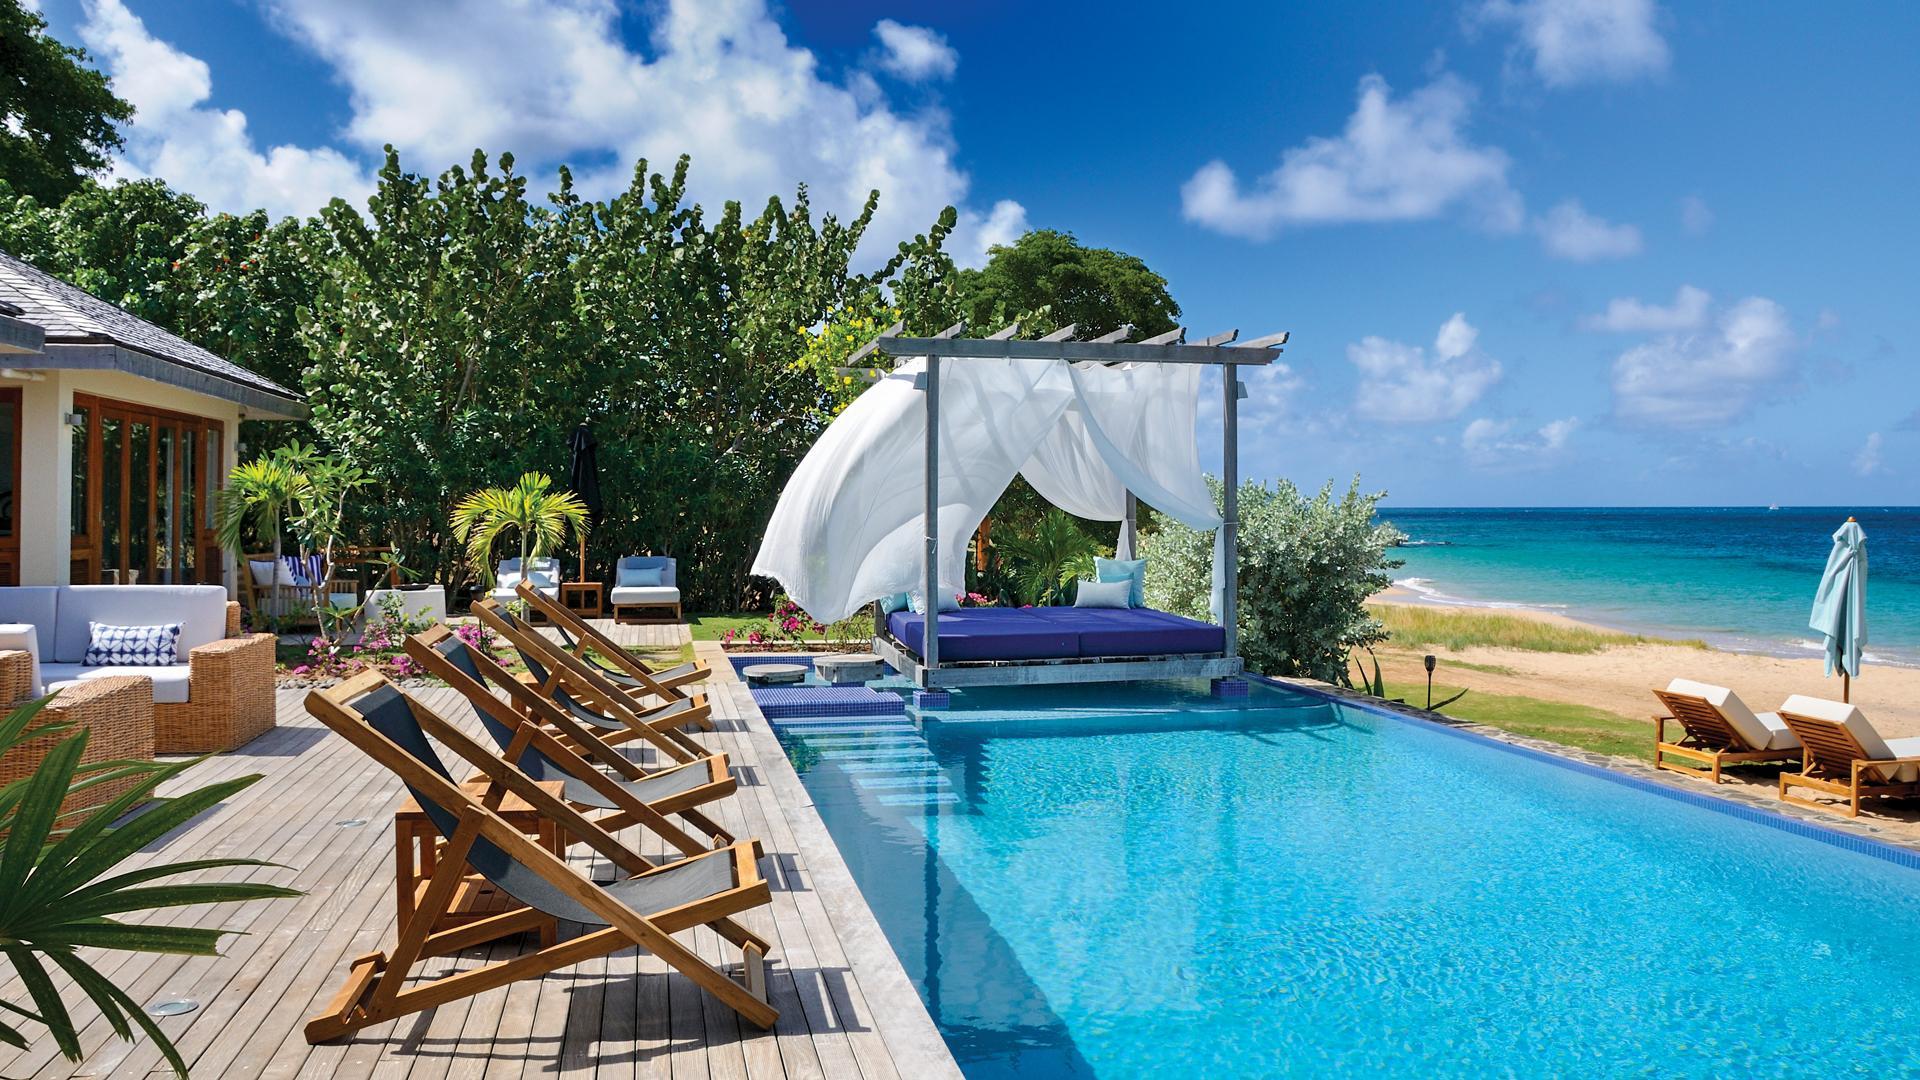 Beach-front villas on the island of Mayreau